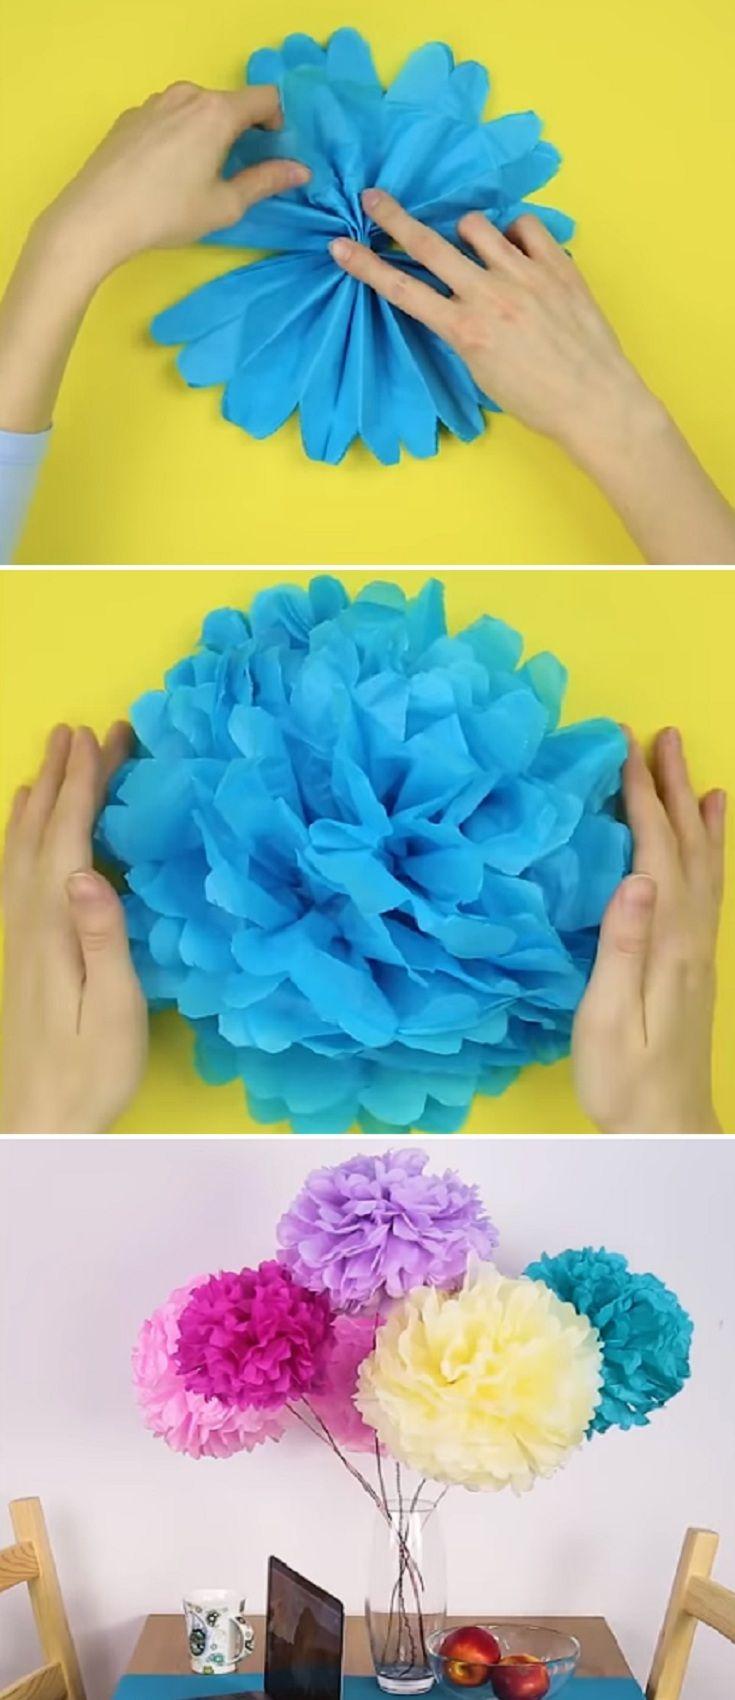 33 Cool Diy Home Decor Ideas Video Cool Decor Ideas Diy Crafts Diy Crafts Crafty Diy